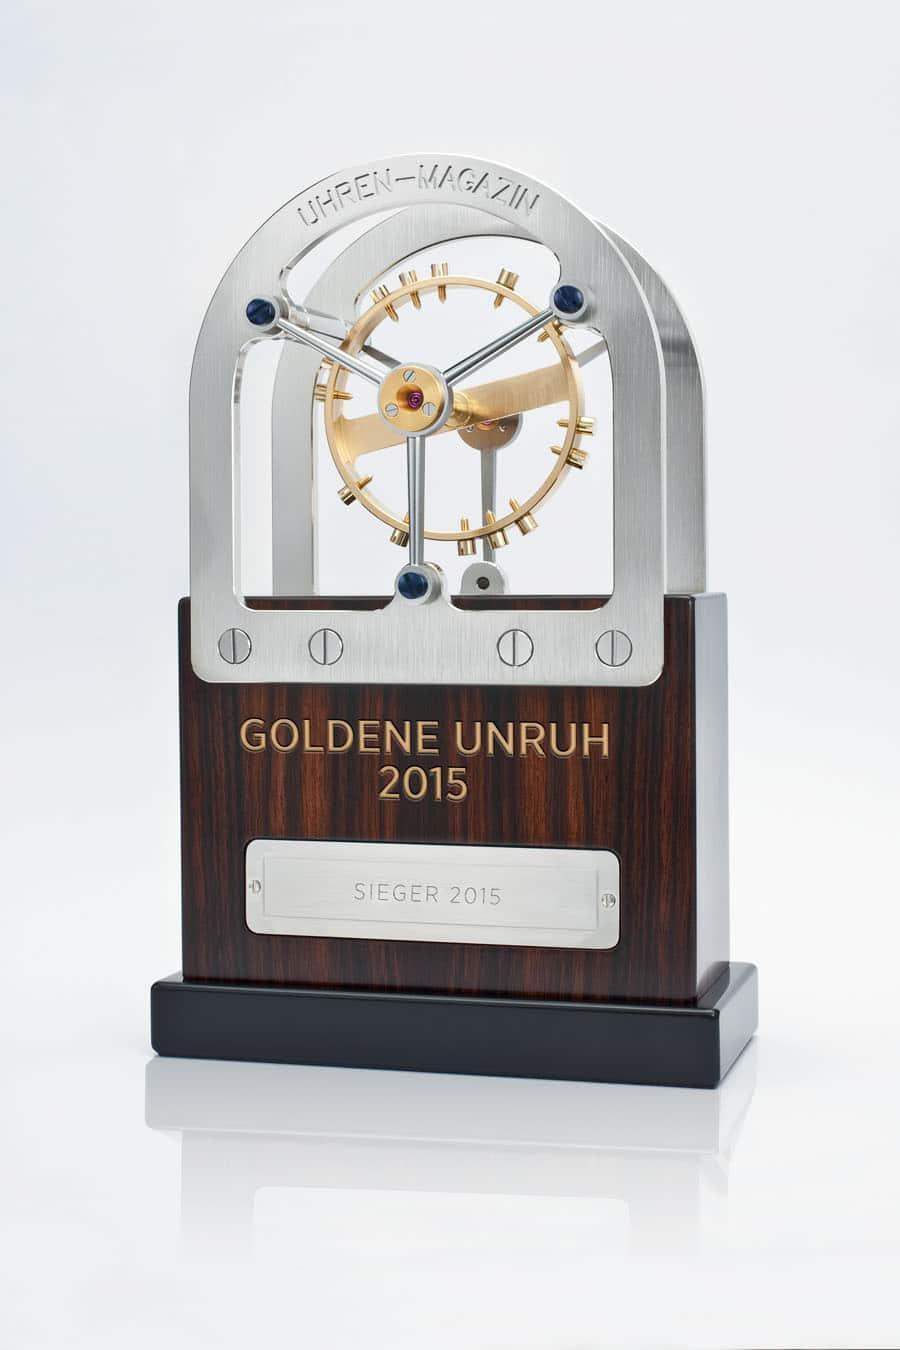 Goldene Unruh 2015 Trophäe